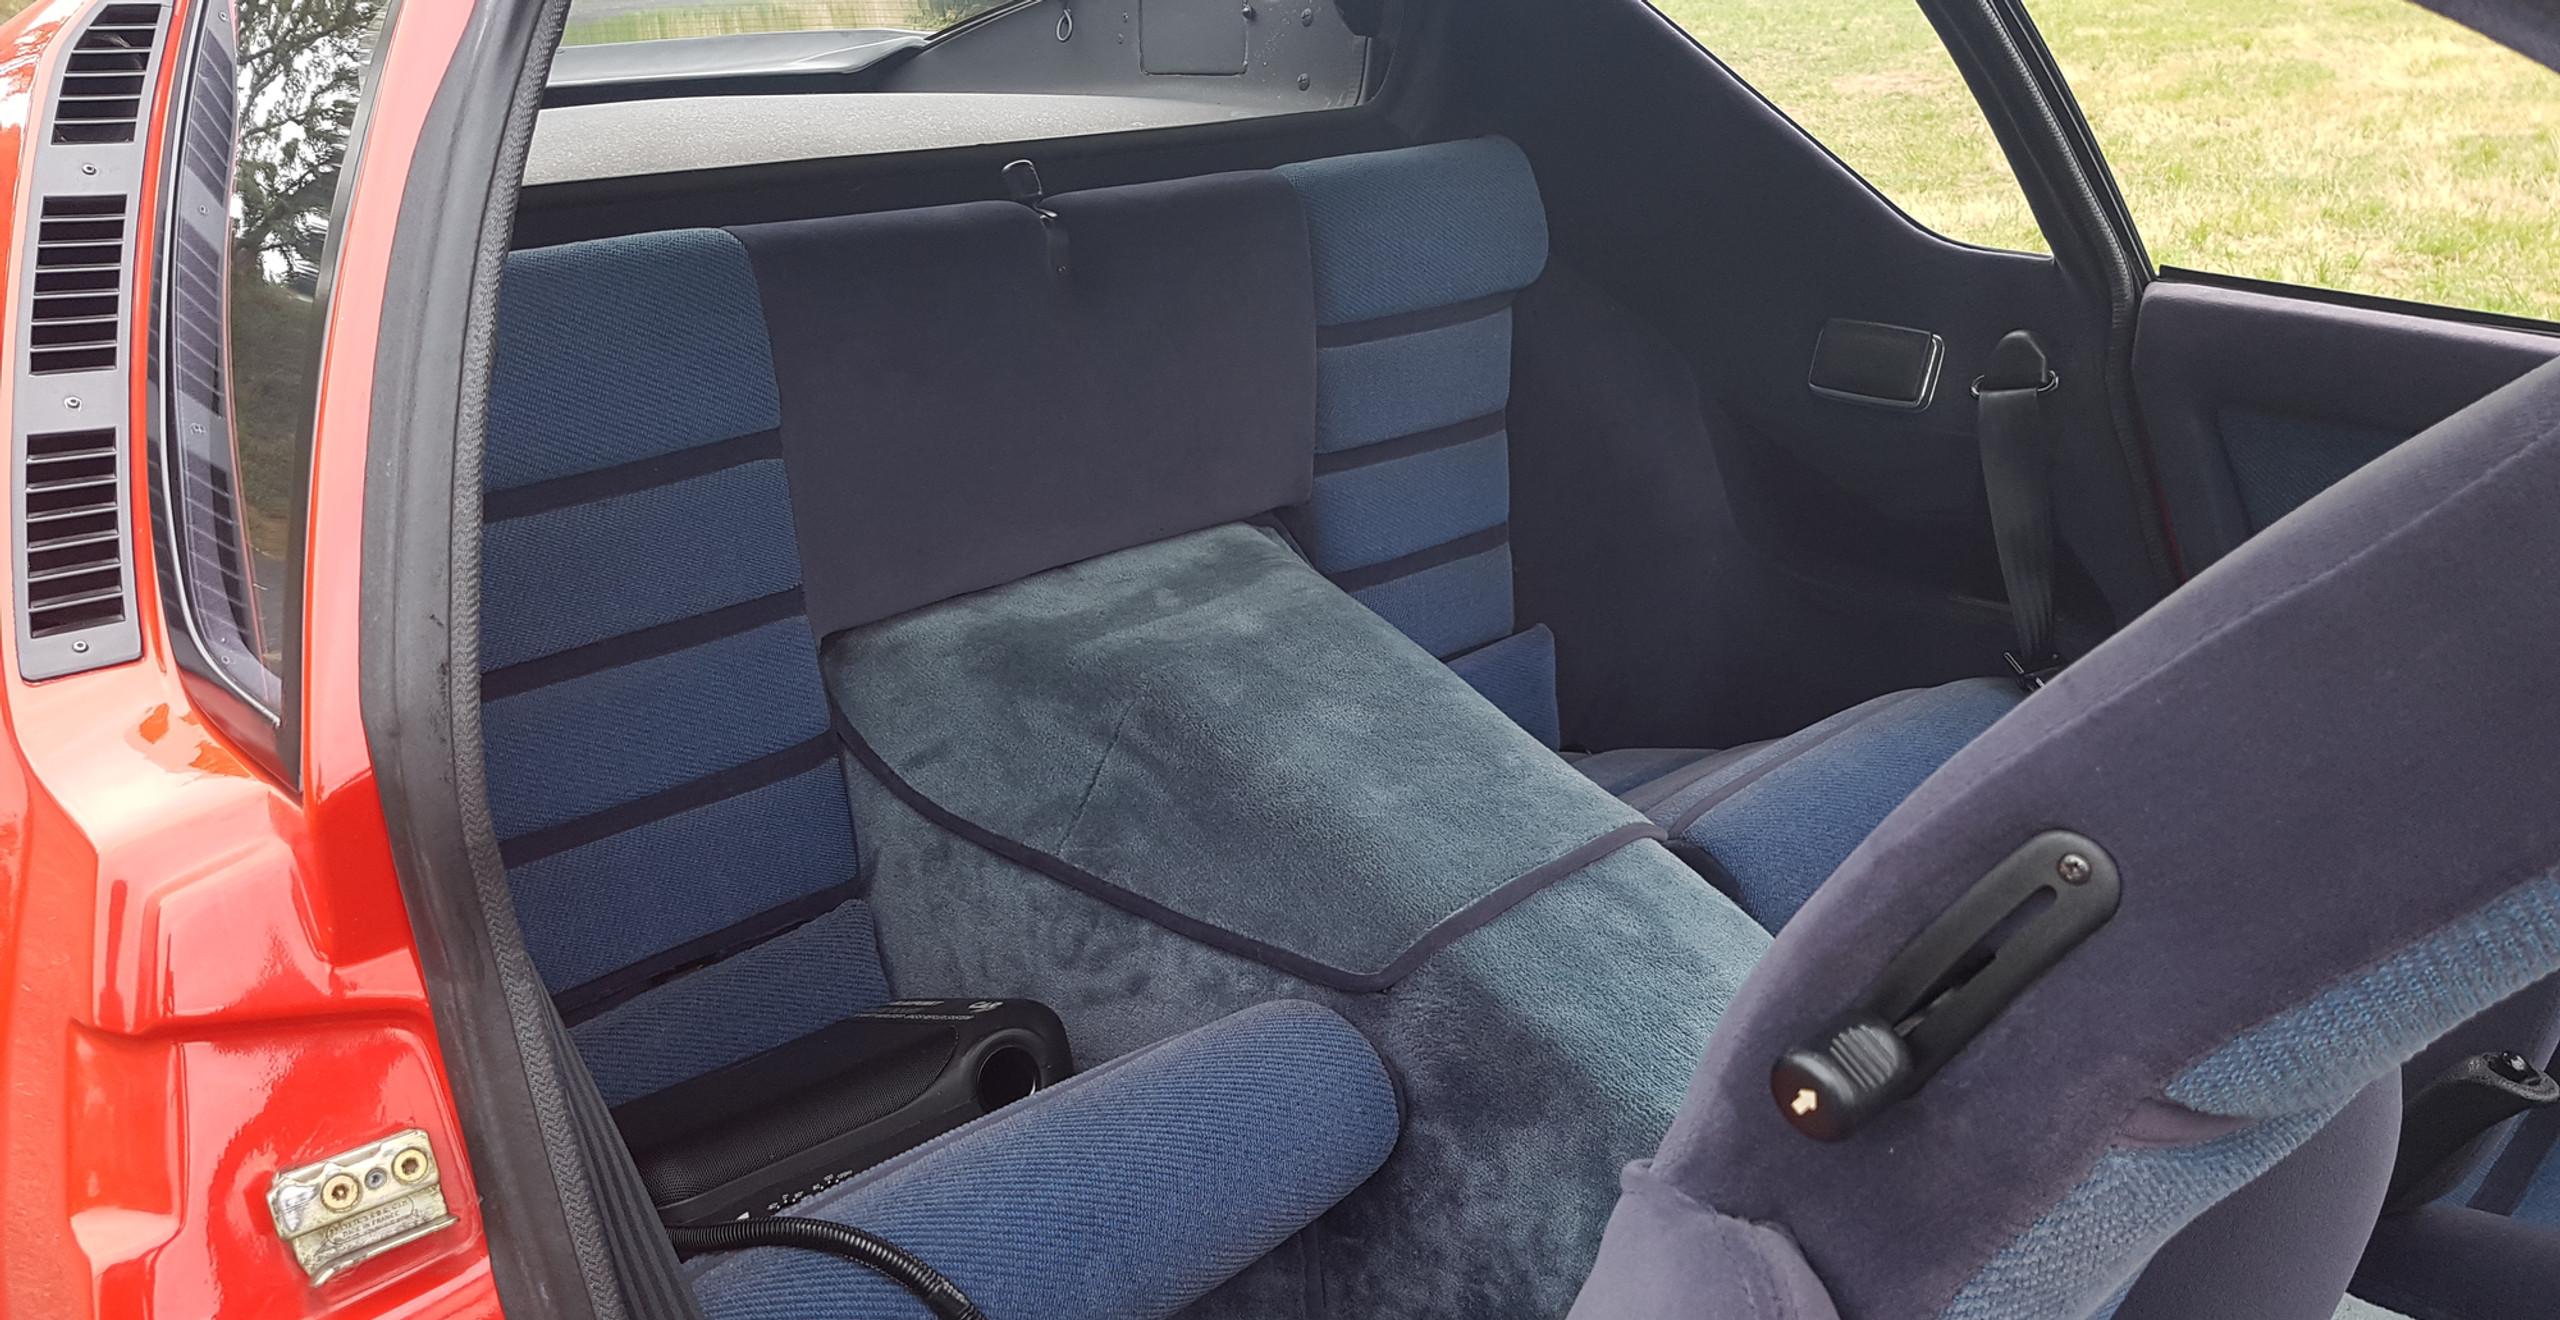 Import Auto Allemagne - Auto Convoi Allemagne - Alpine A310 pack GT 2.7 V6 150ch